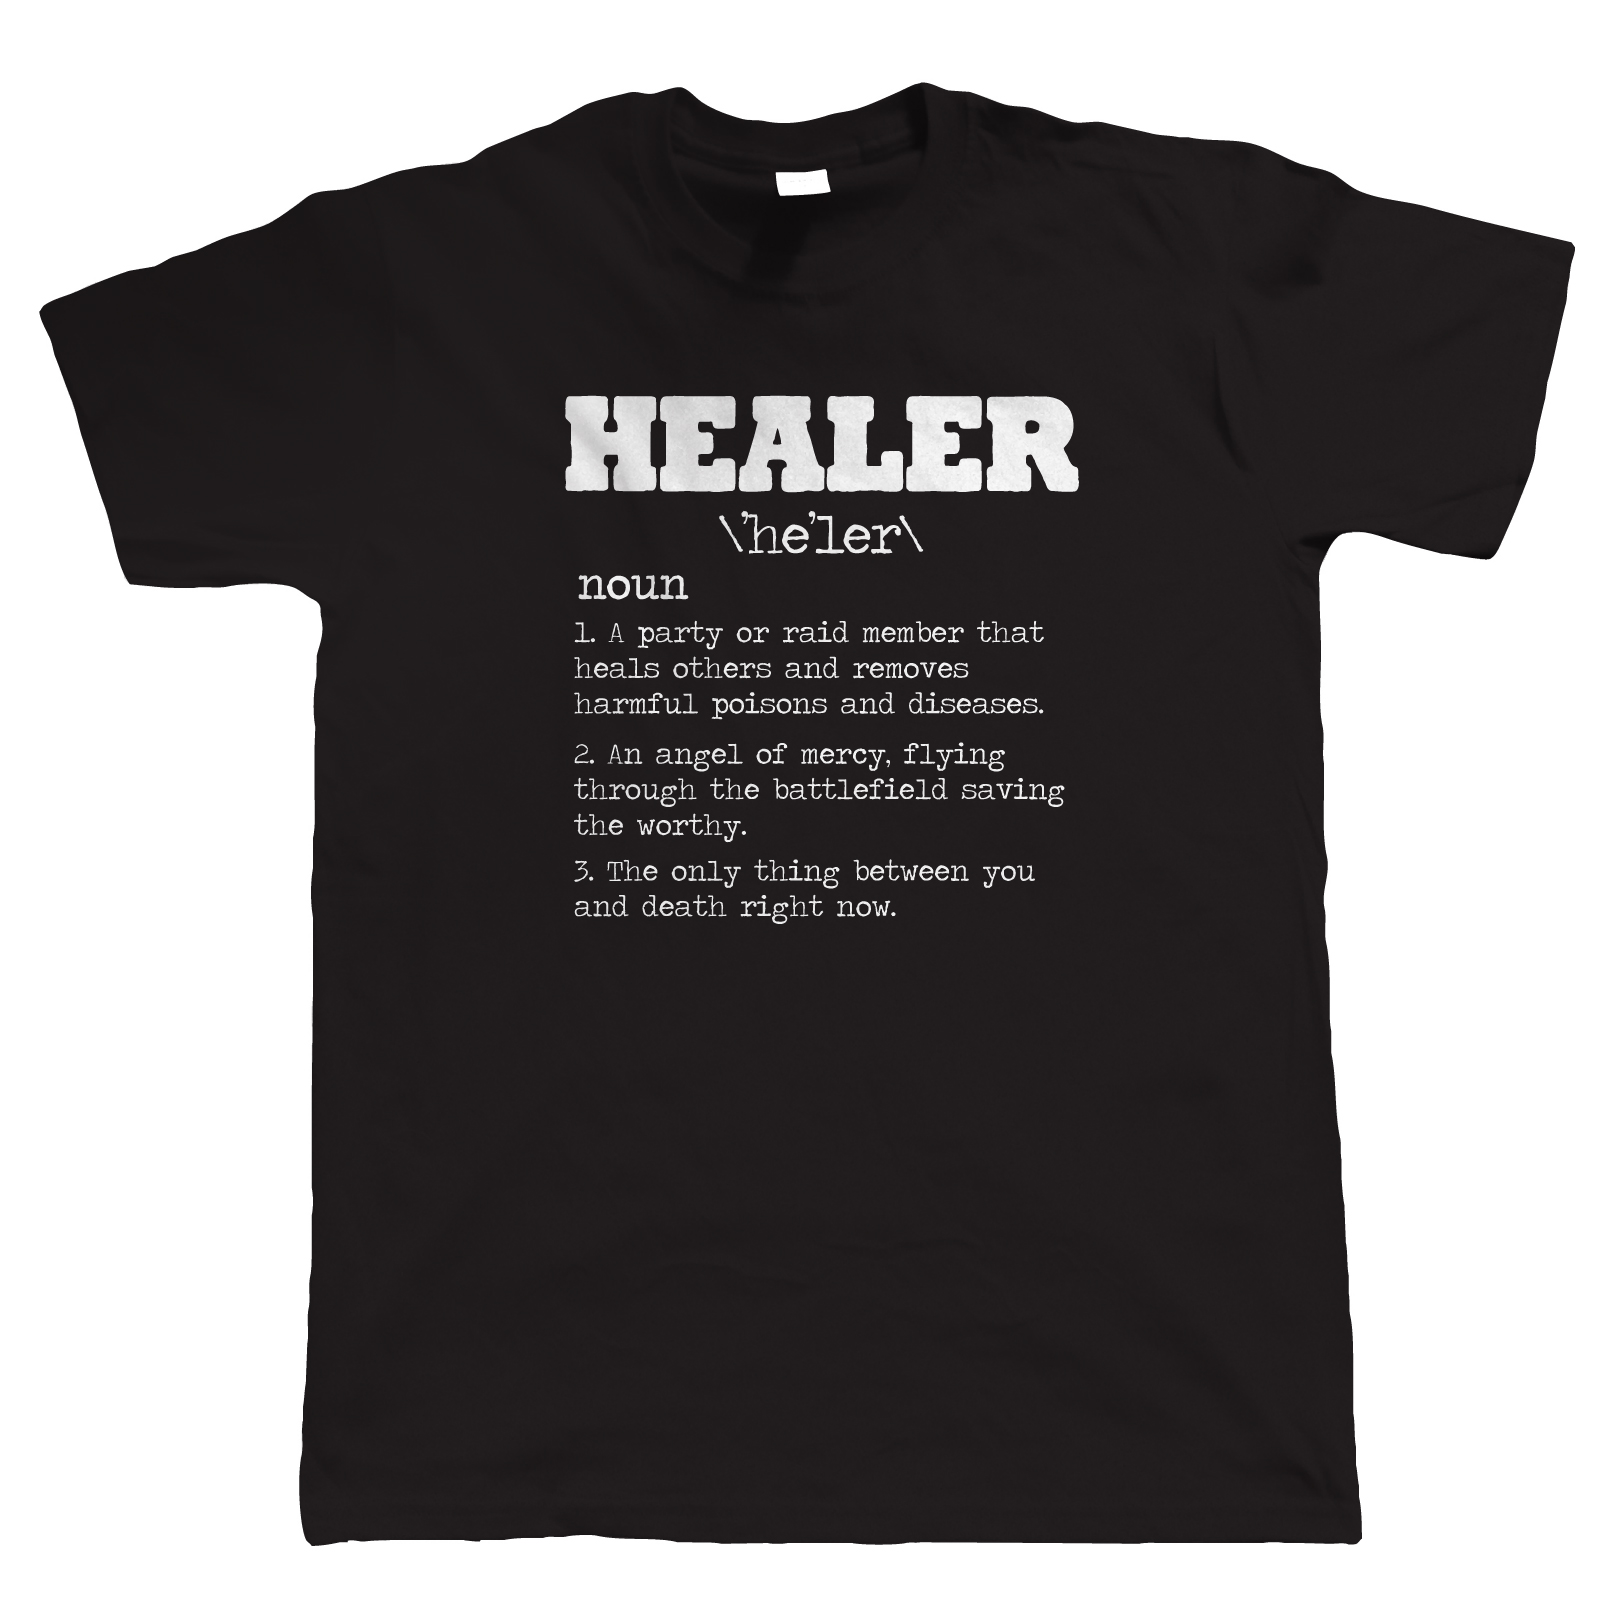 Healer RPG Gamer T Shirt - Video Game MMORPG PC Gamer WoW Horde Alliance Rogue Fashion Unique Classic Cotton Men T-Shirt